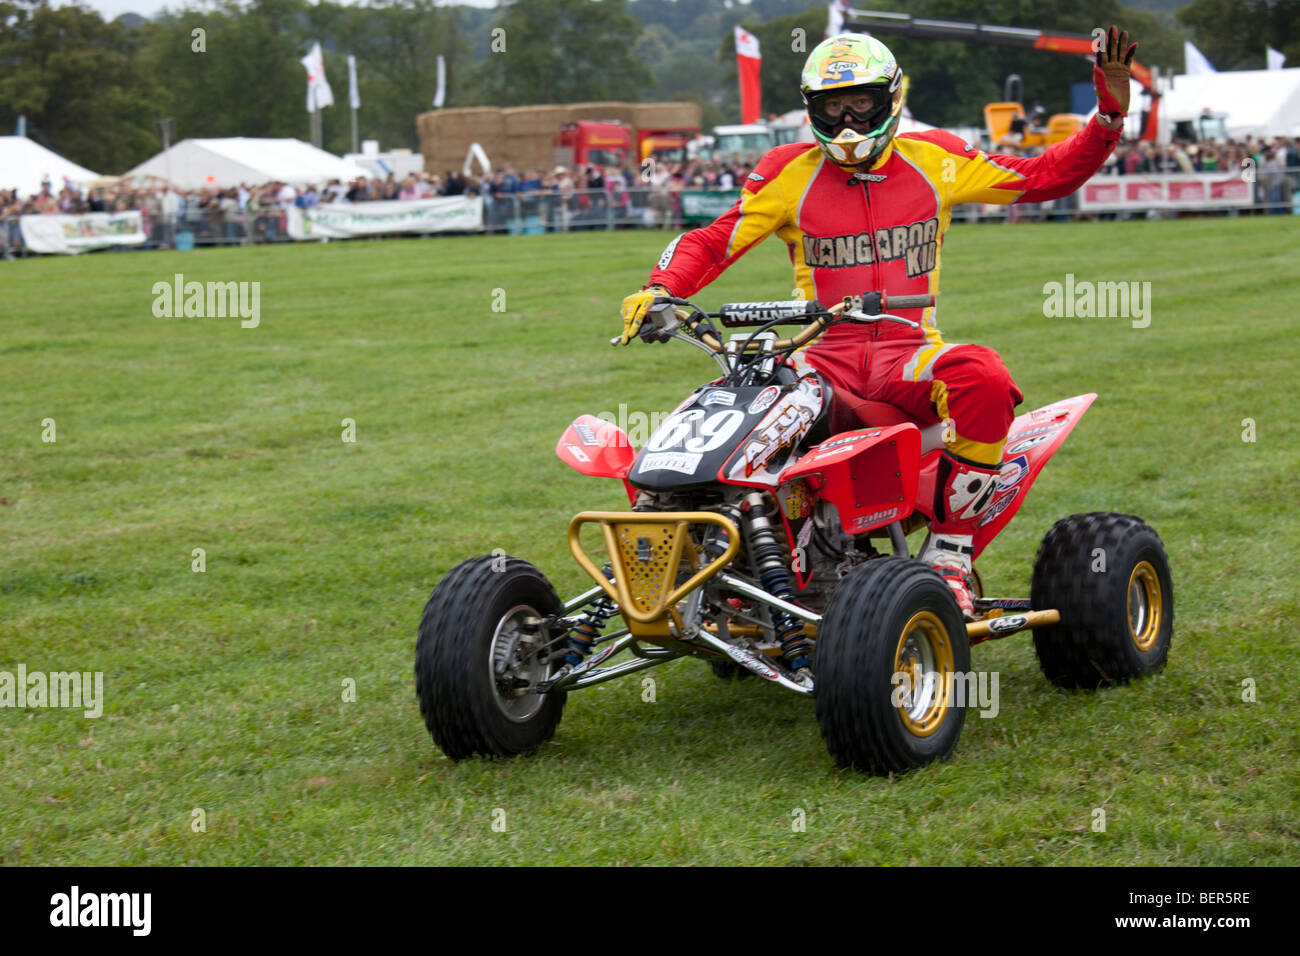 Kangaroo Kid alias Matt Coulter riding quad stunt bike Moreton Show September 2009 UK Stock Photo